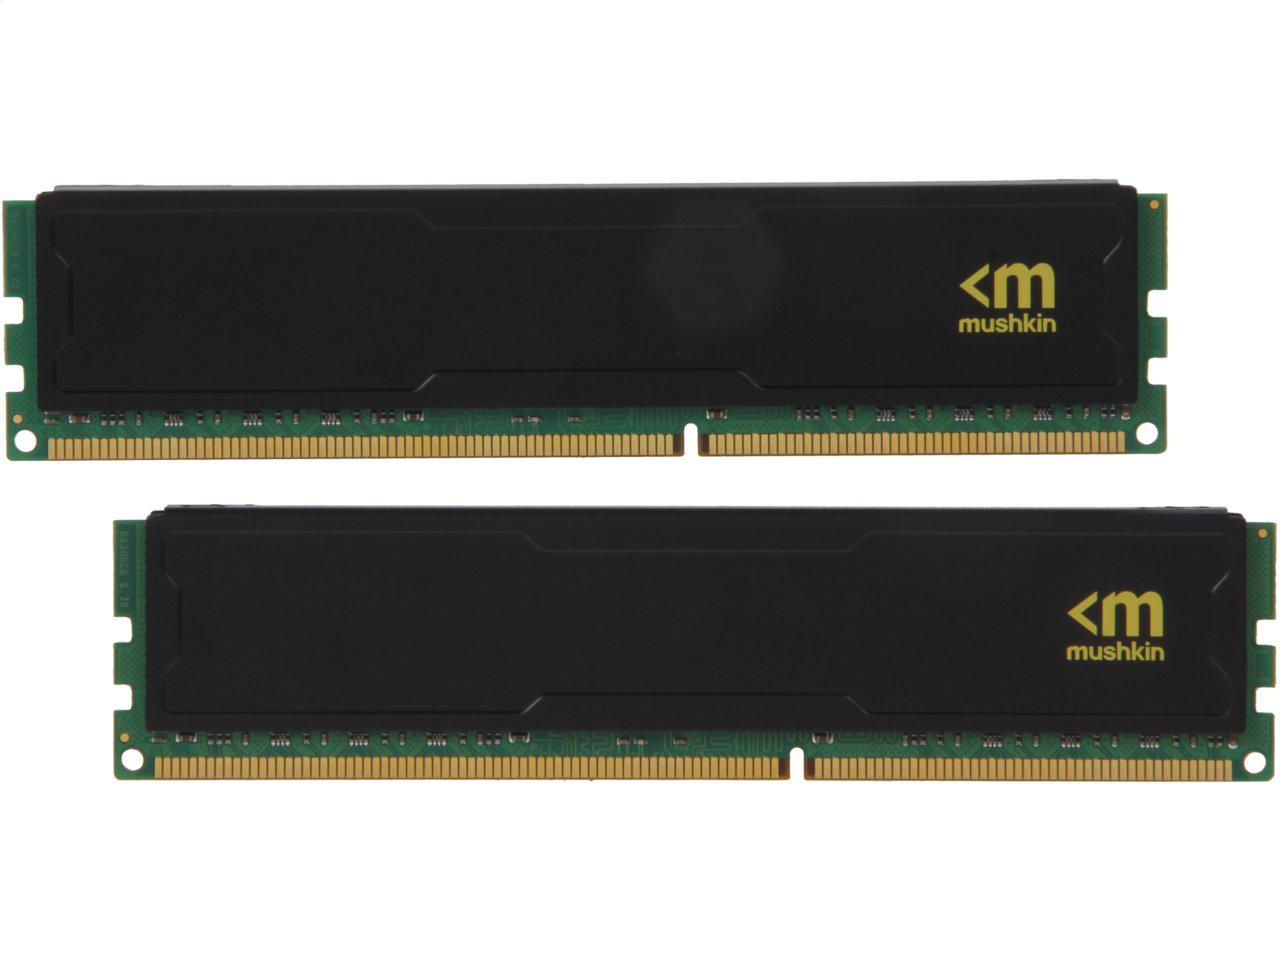 PC Components: 16 GB (2 x 8 GB) Mushkin Enhanced Stealth 240-Pin DDR3 1600 (PC3 12800) CL9 1.5V Desktop Memory Kit for $74.99 & More + Free Shipping @ Newegg.com